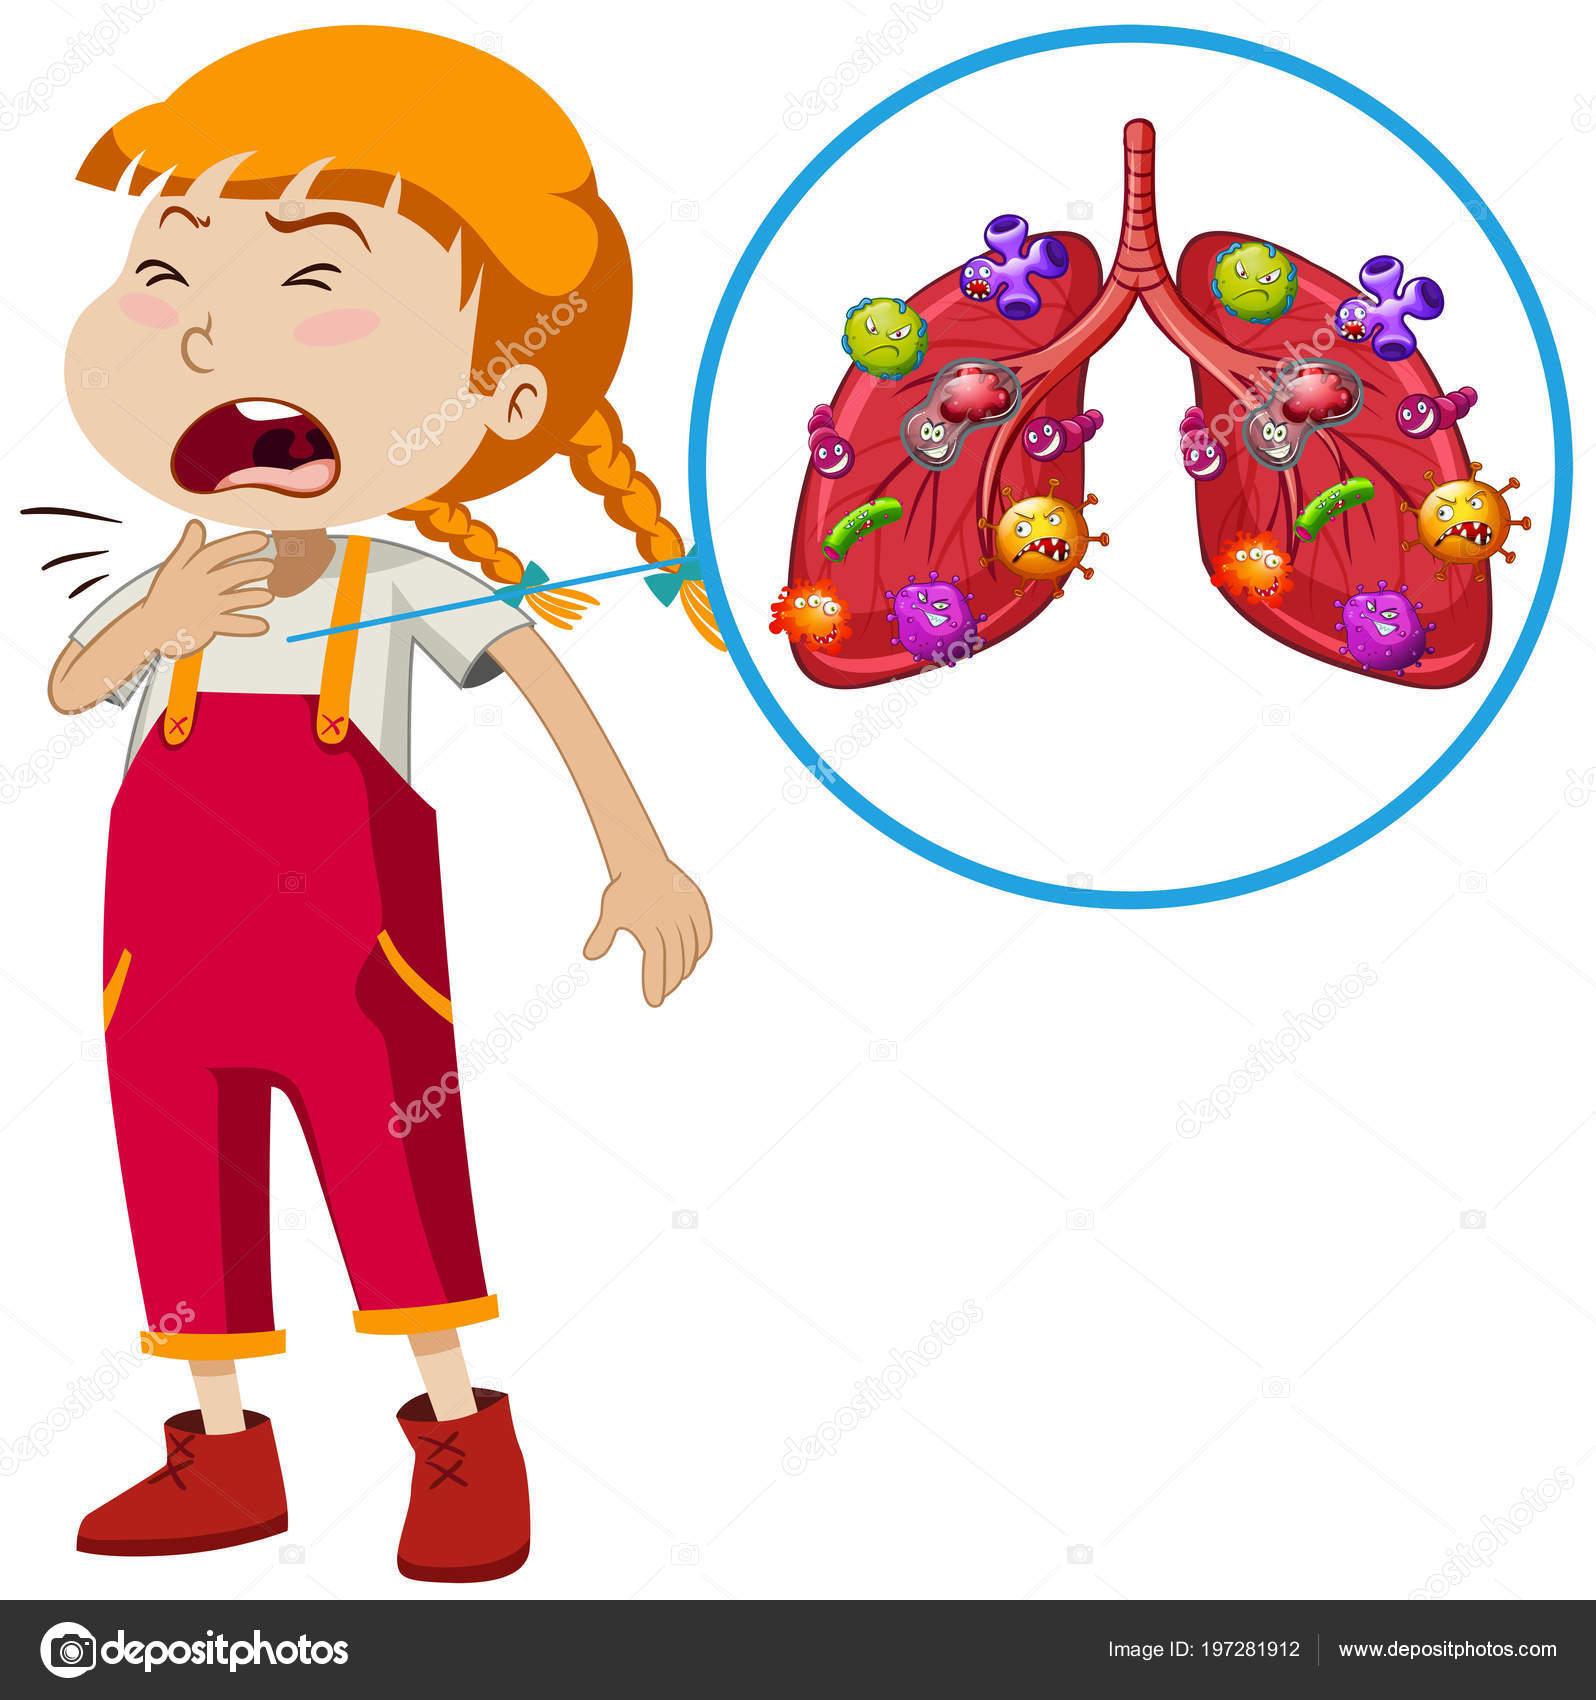 Áˆ Pneumonia Cartoon Stock Pictures Royalty Free Asthma Cartoon Images Download On Depositphotos